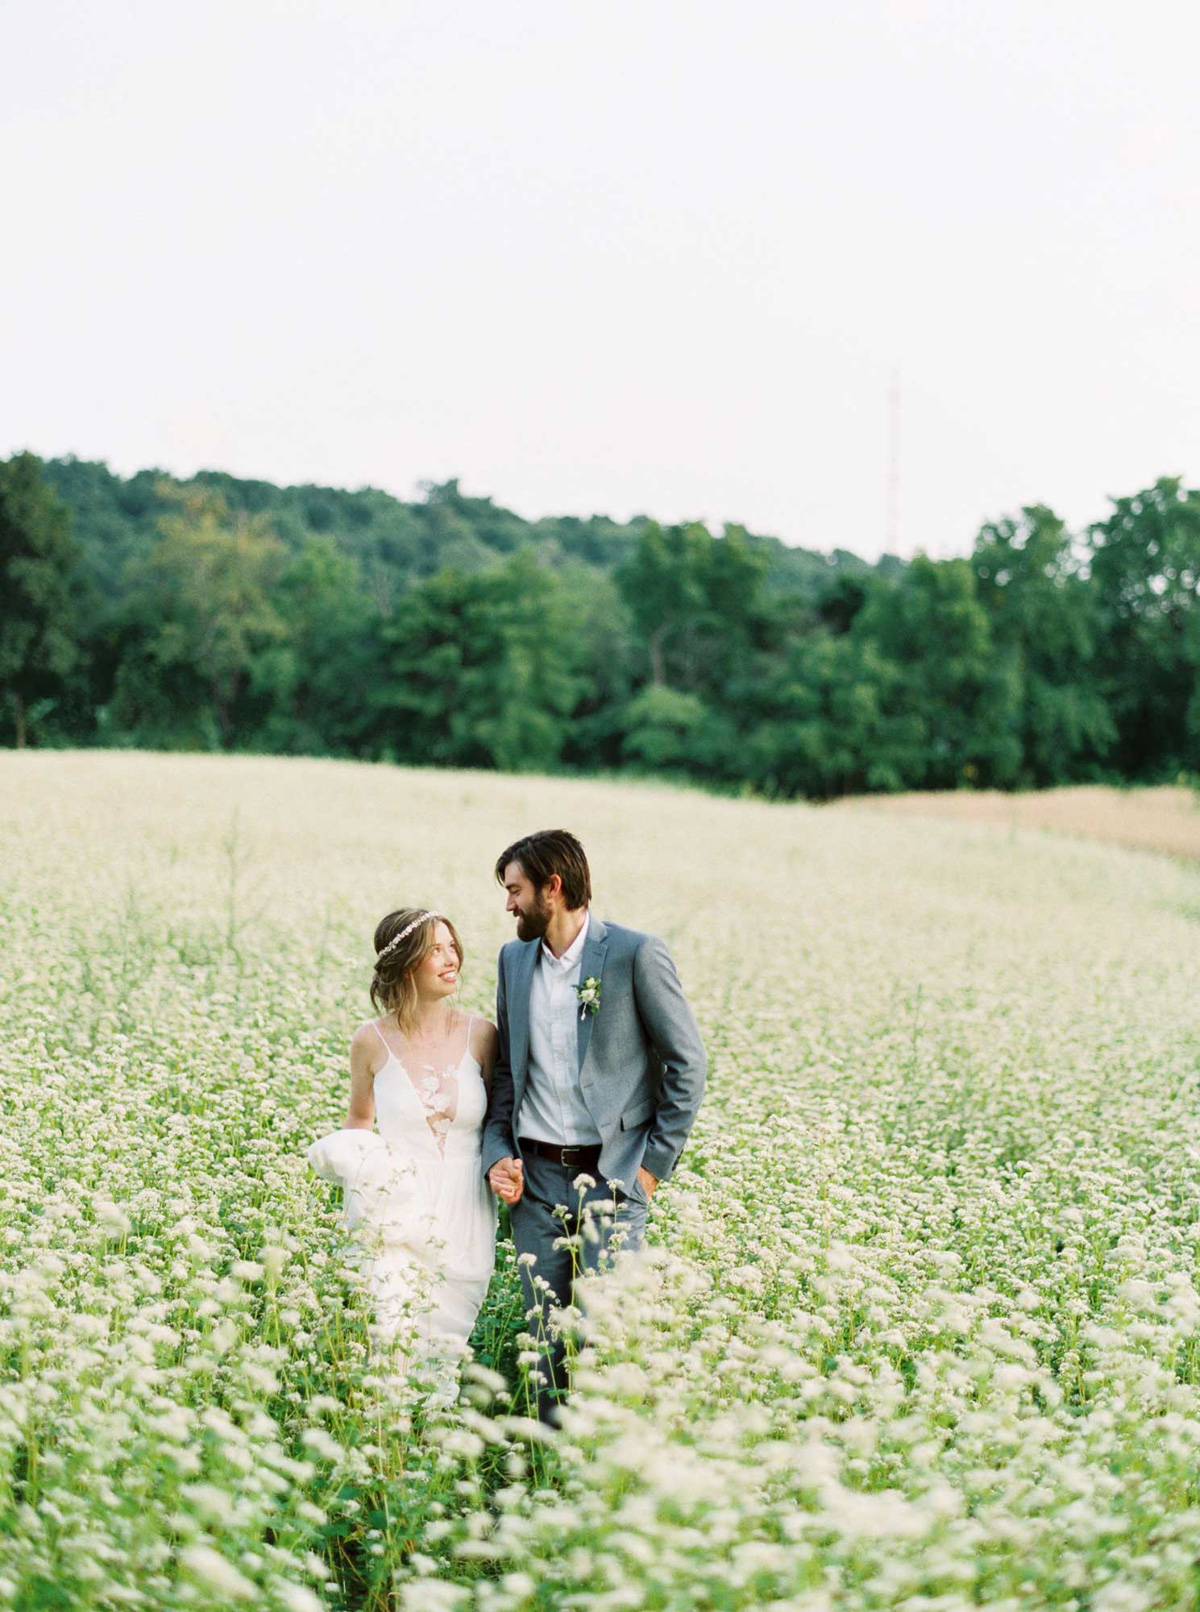 kayla-yestal-vineyard-bride-swish-list-woodland-weddings-niagara-wedding-editorial-37.jpg